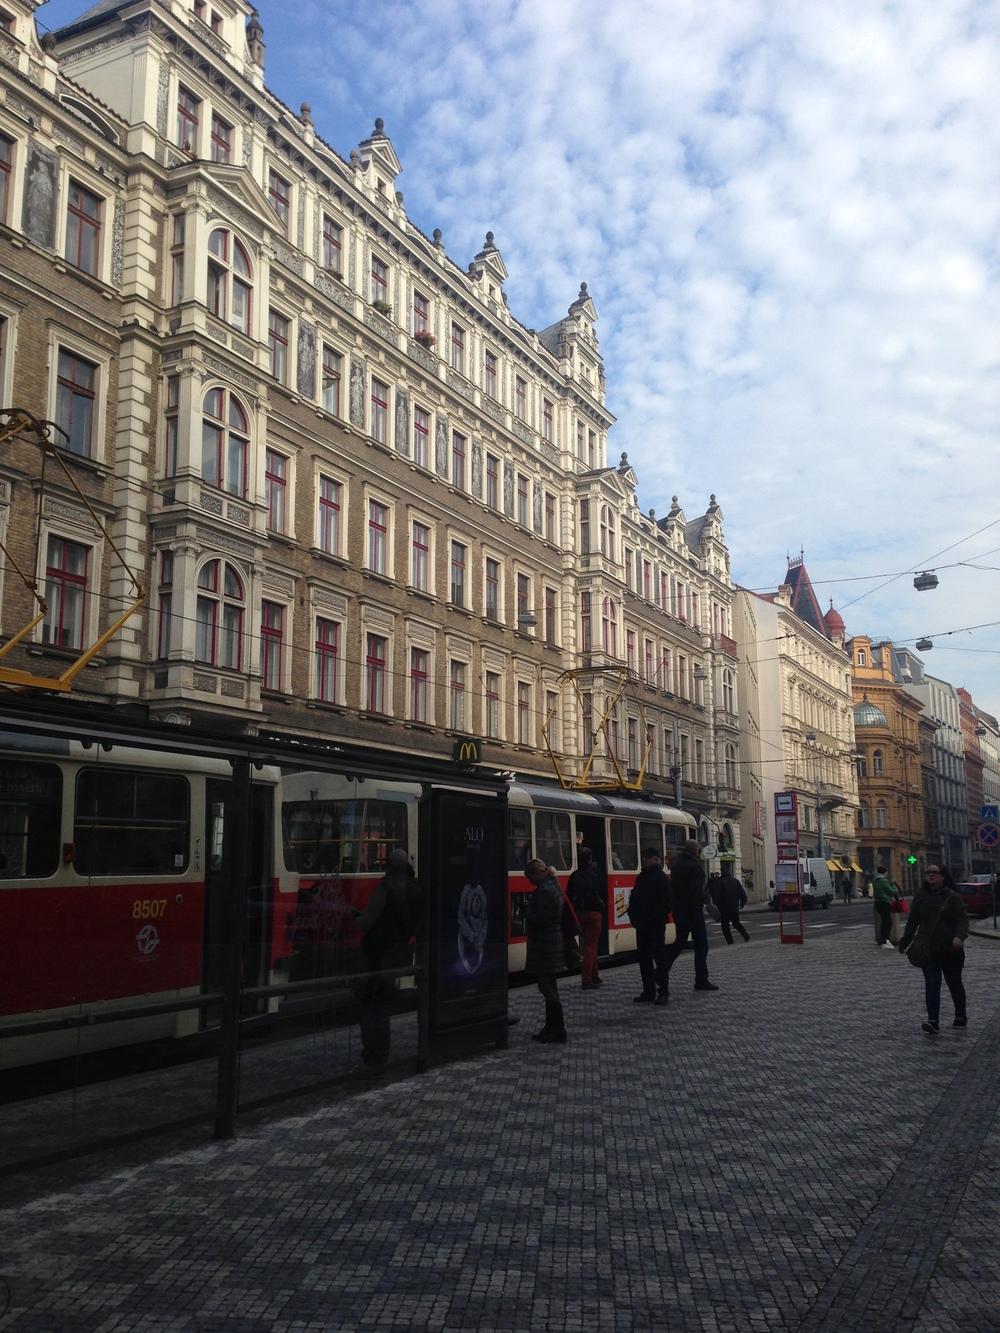 Prague Street and Tram